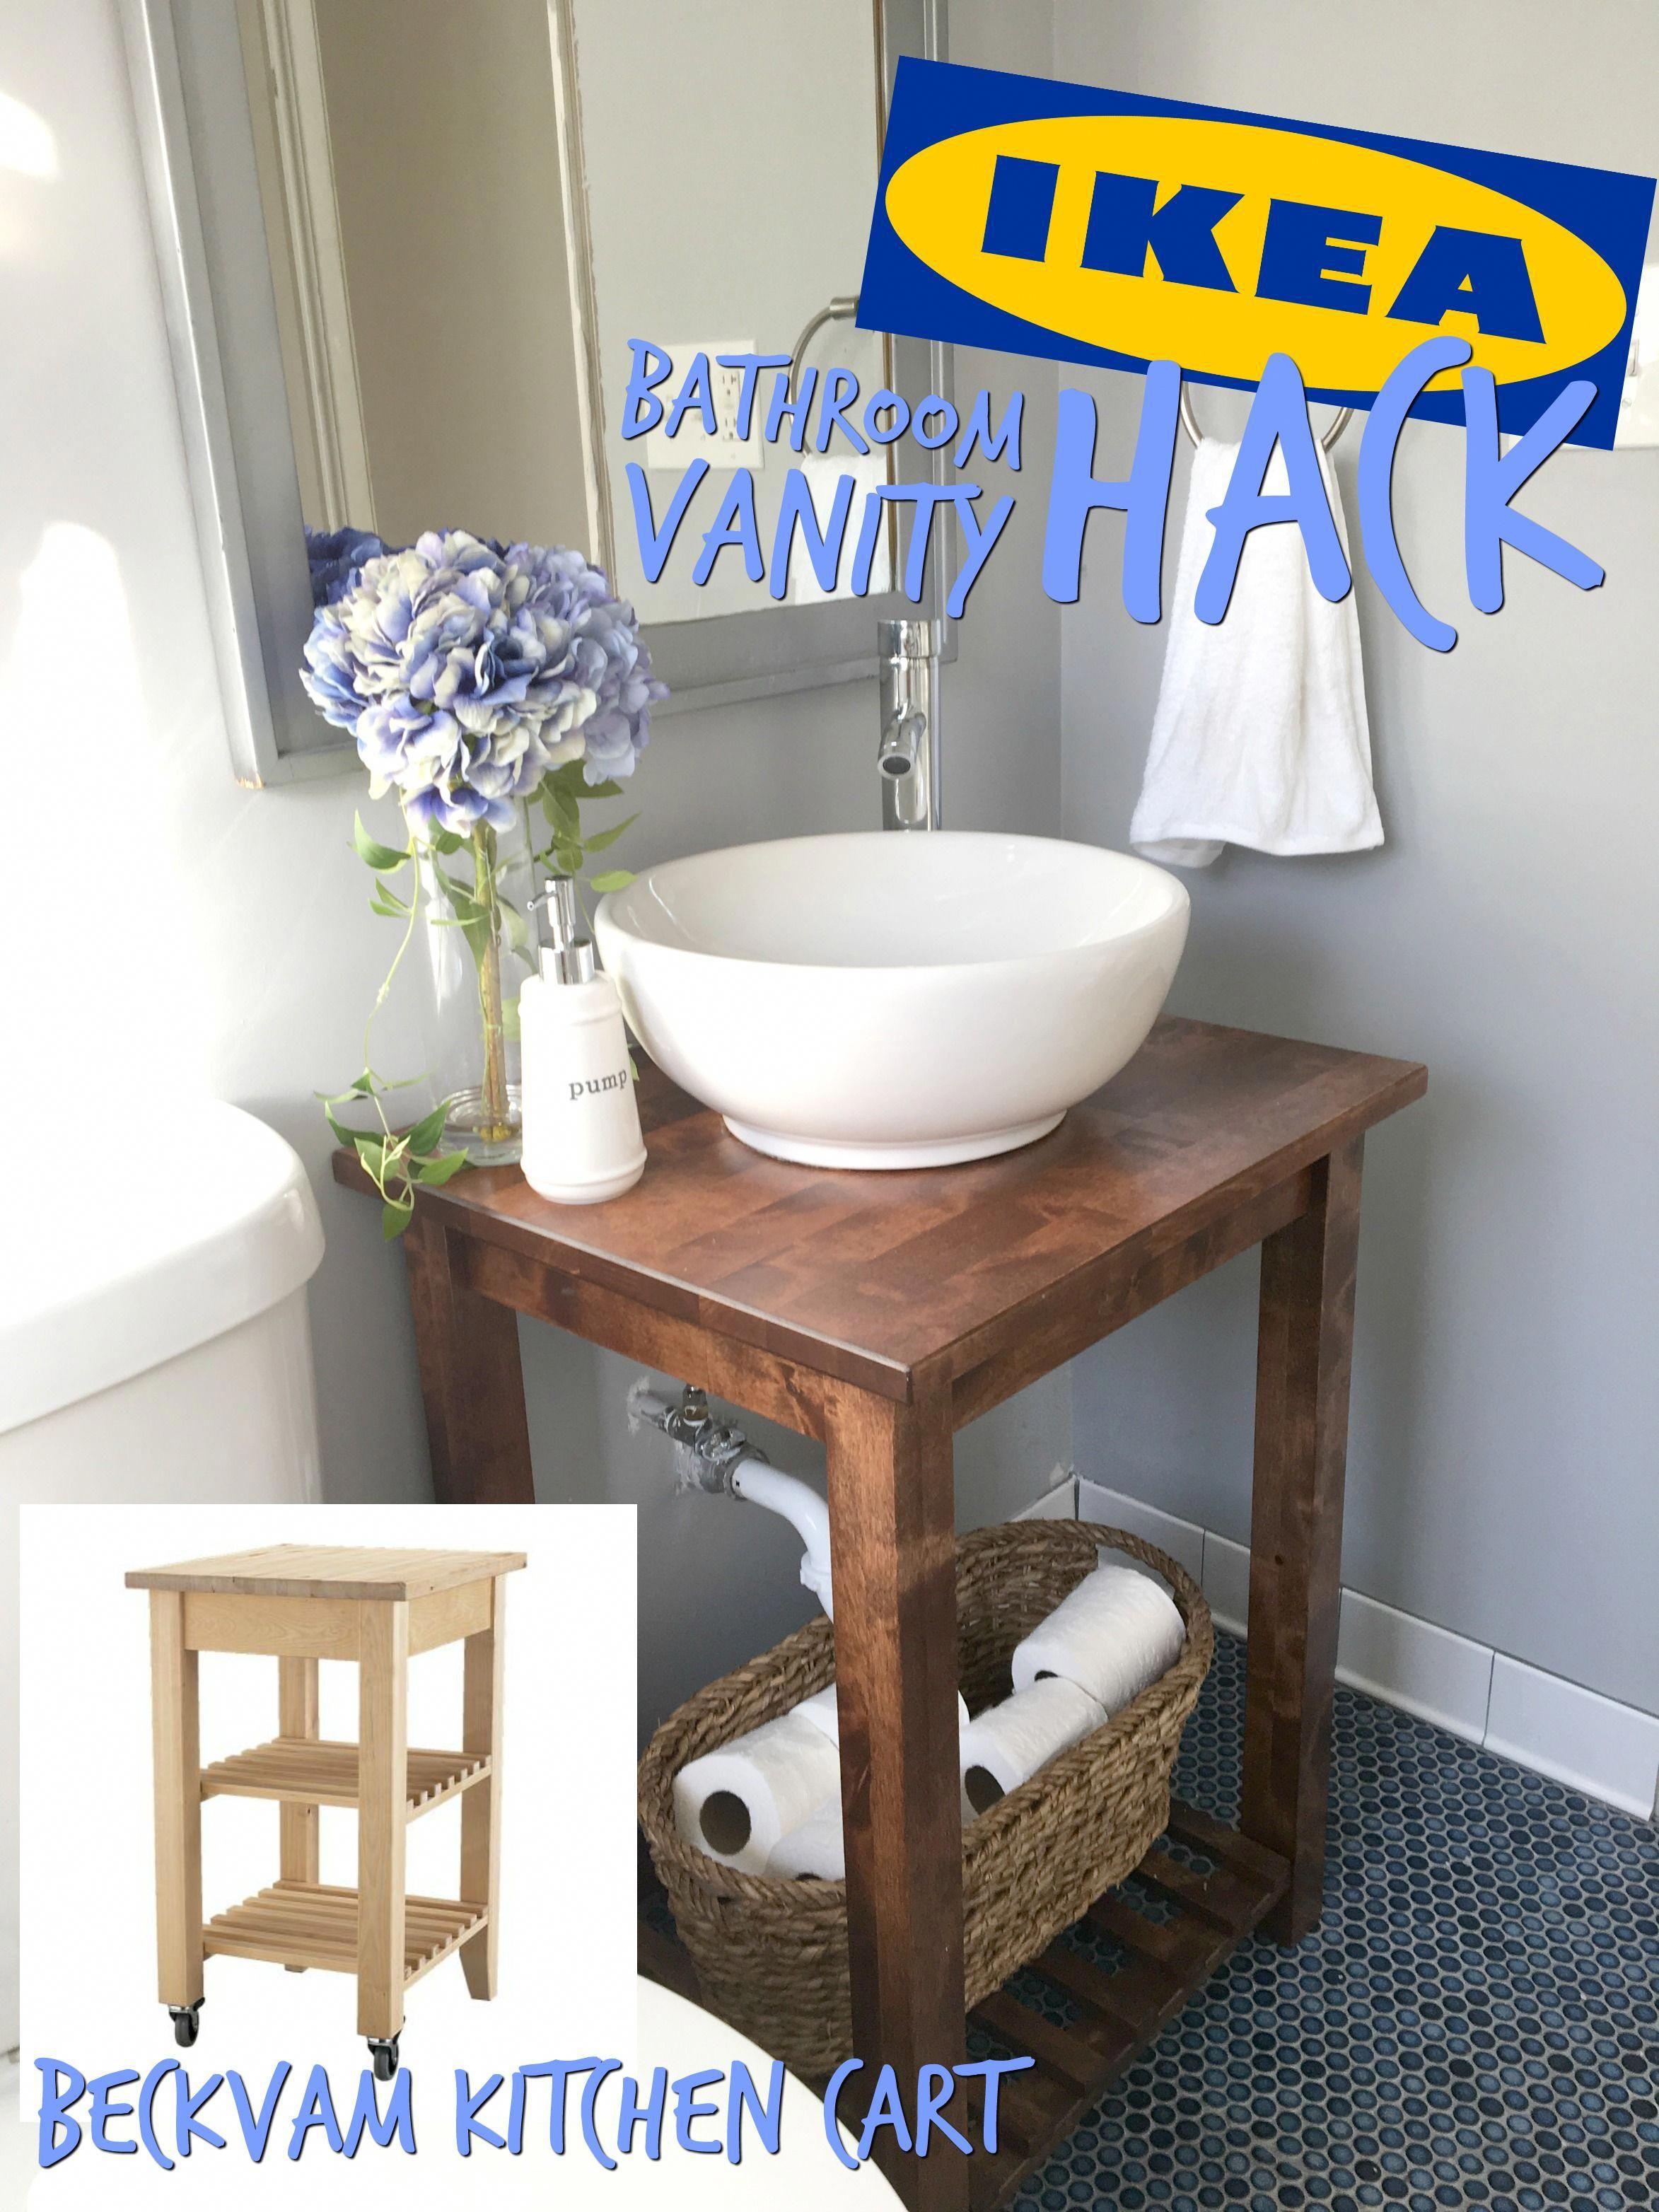 26 fantastic bathroom vanities single sink 60 inches on bathroom vanity cabinets clearance id=21453